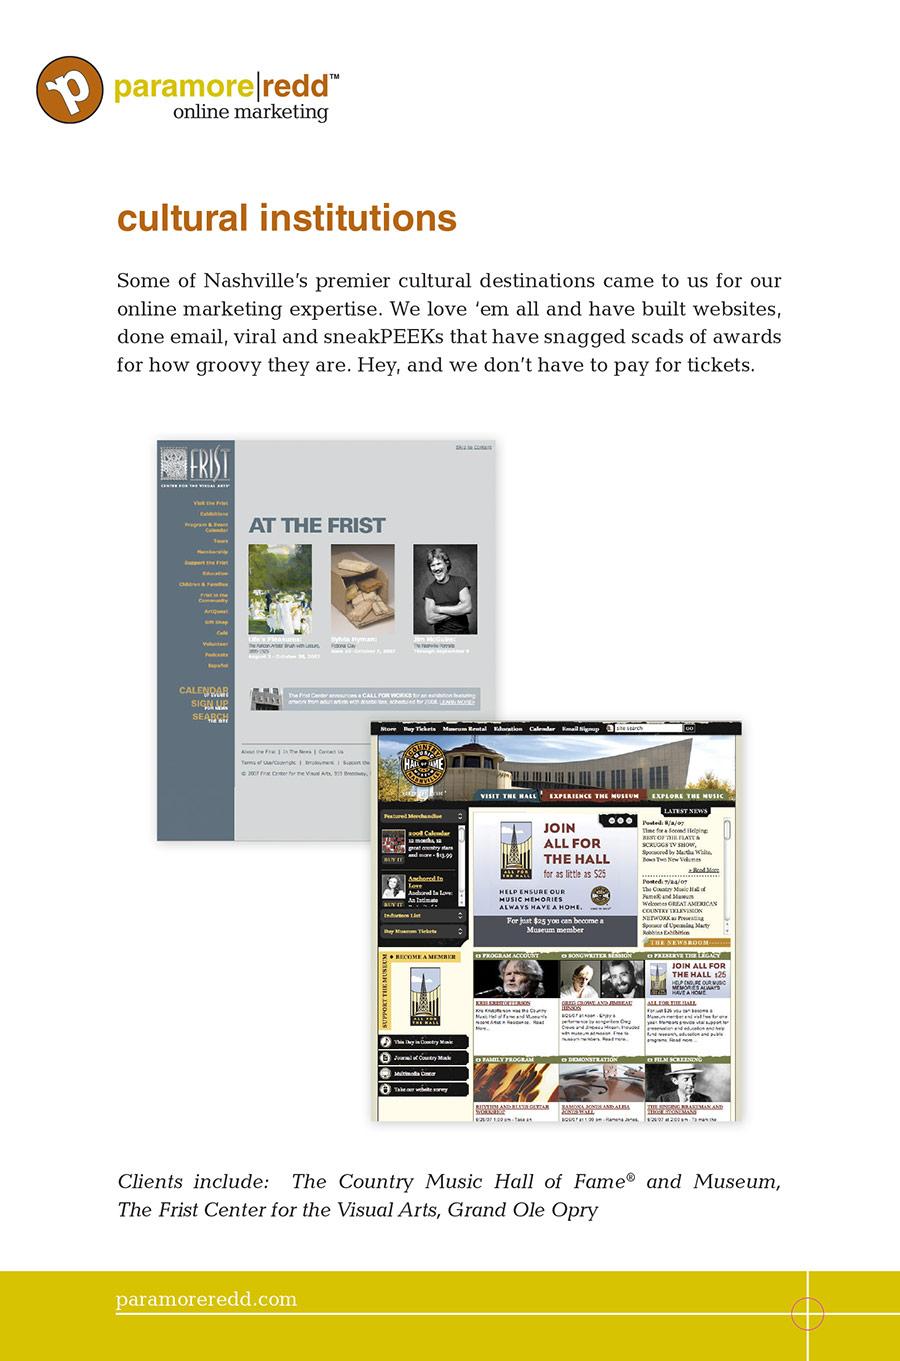 Paramore|Redd Case Study Brochure